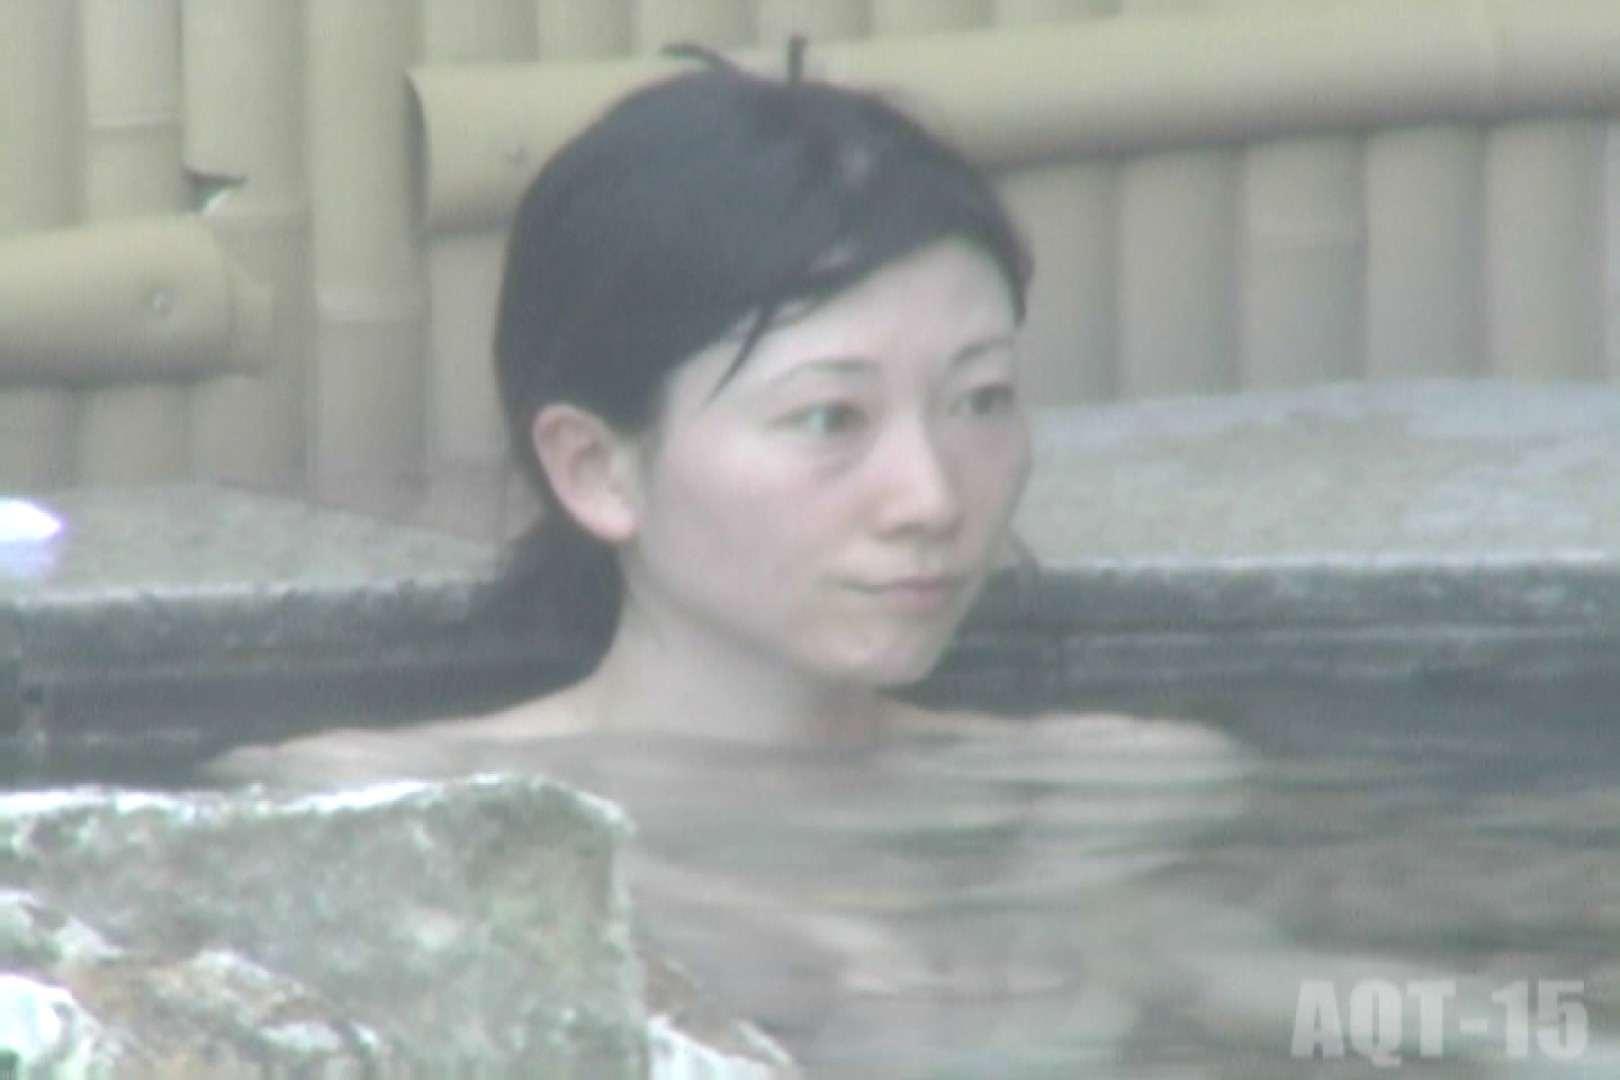 Aquaな露天風呂Vol.835 盗撮シリーズ   露天風呂編  92PIX 39